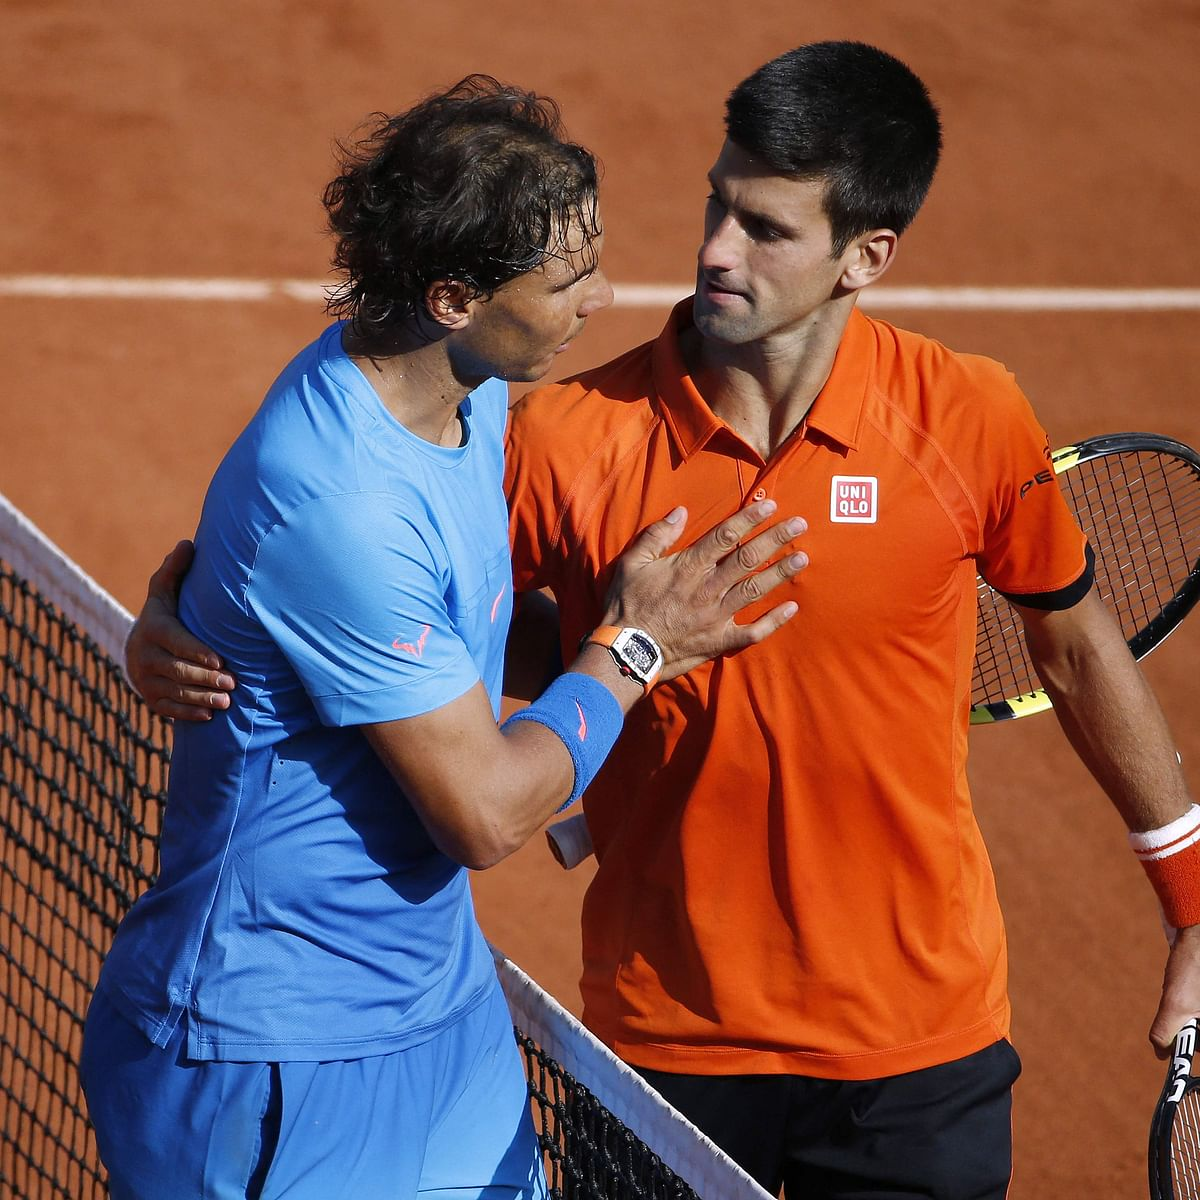 French Open: Novak Djokovic stuns 13-time champion Rafael Nadal, sets up summit clash against Tsitsipas